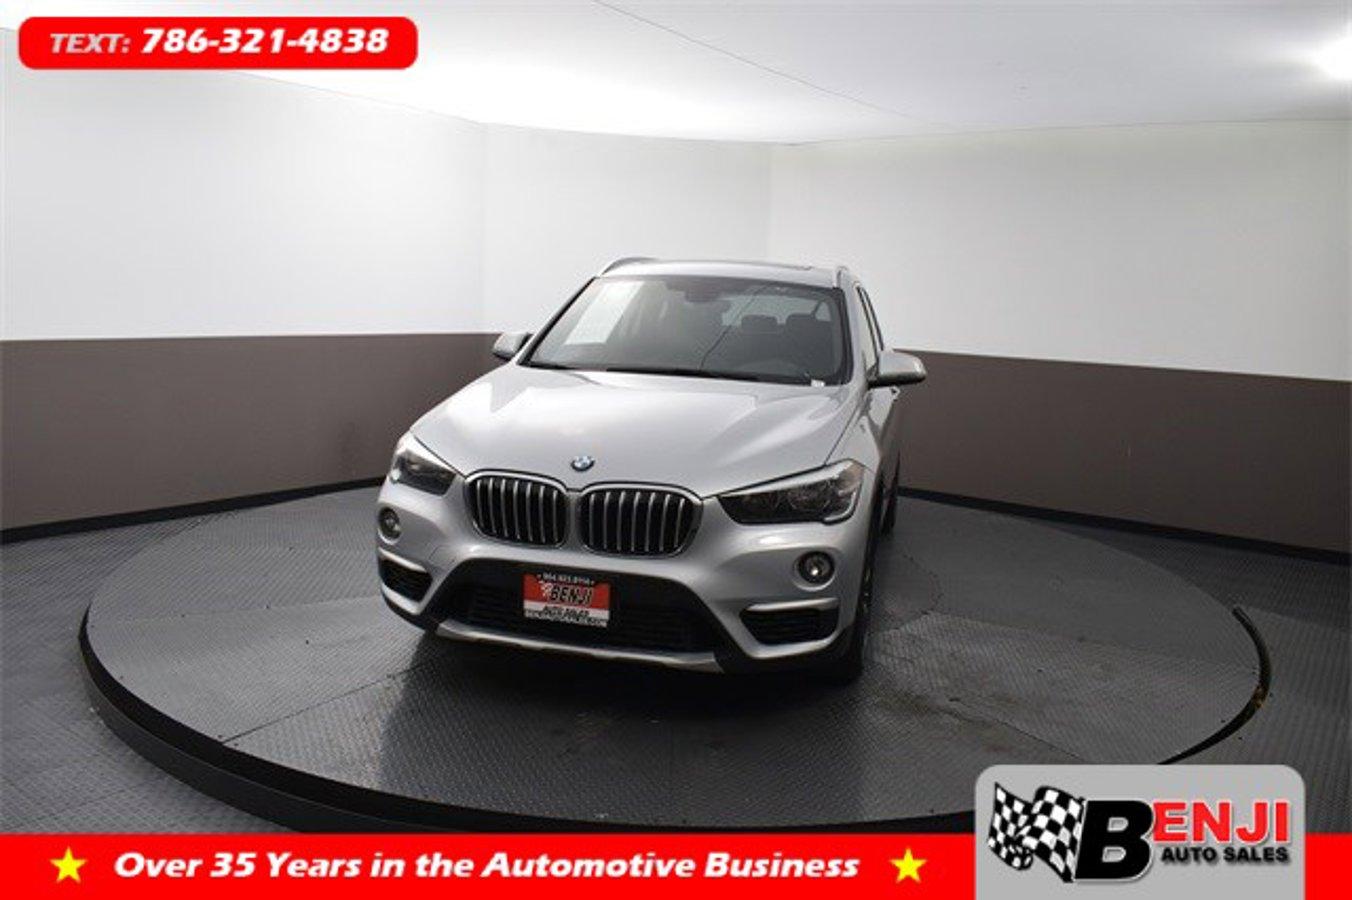 Used BMW X1 2018 BROWARD XDRIVE28I